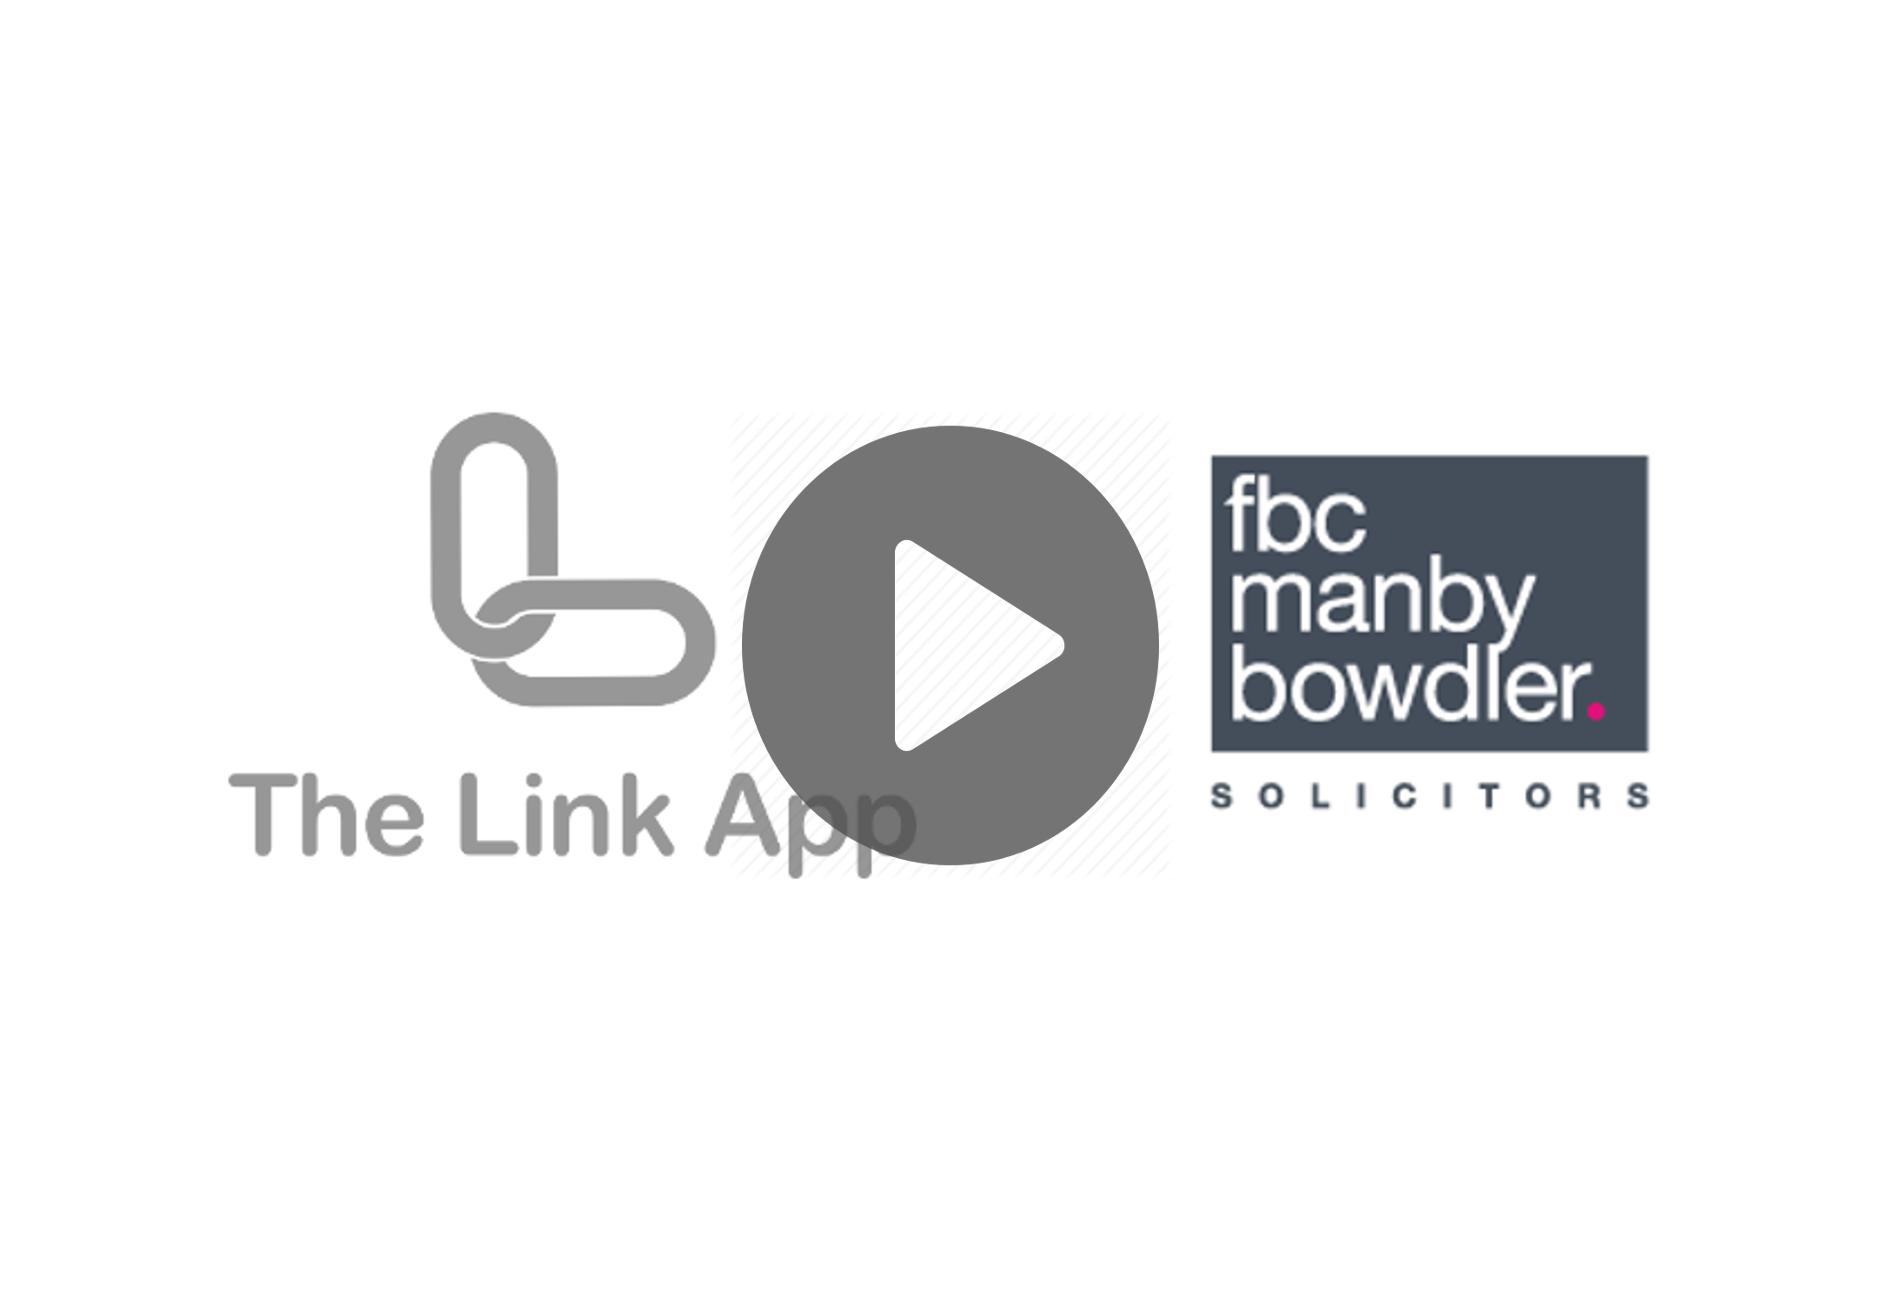 Case Study: FBC Manby Bowdler